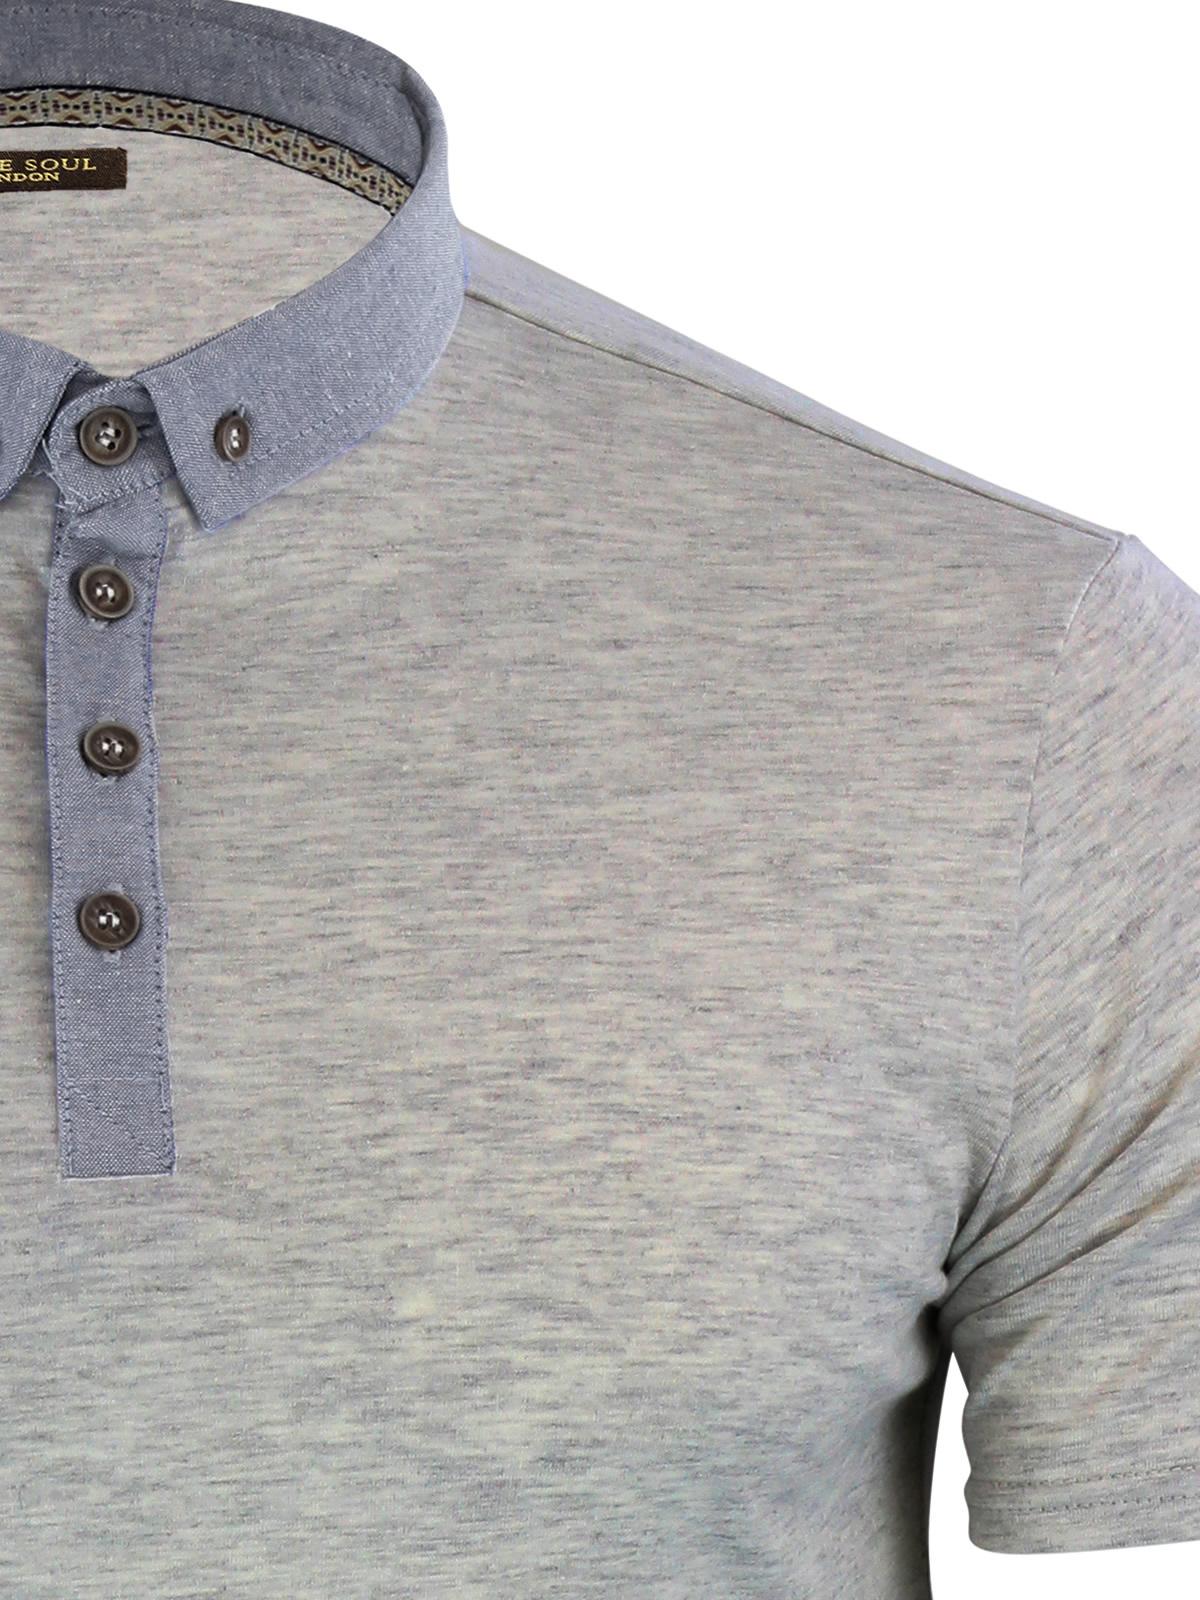 Mens-Polo-T-Shirt-Brave-Soul-Chimera-Chambray-Collared-Cotton-Casual-Top thumbnail 13